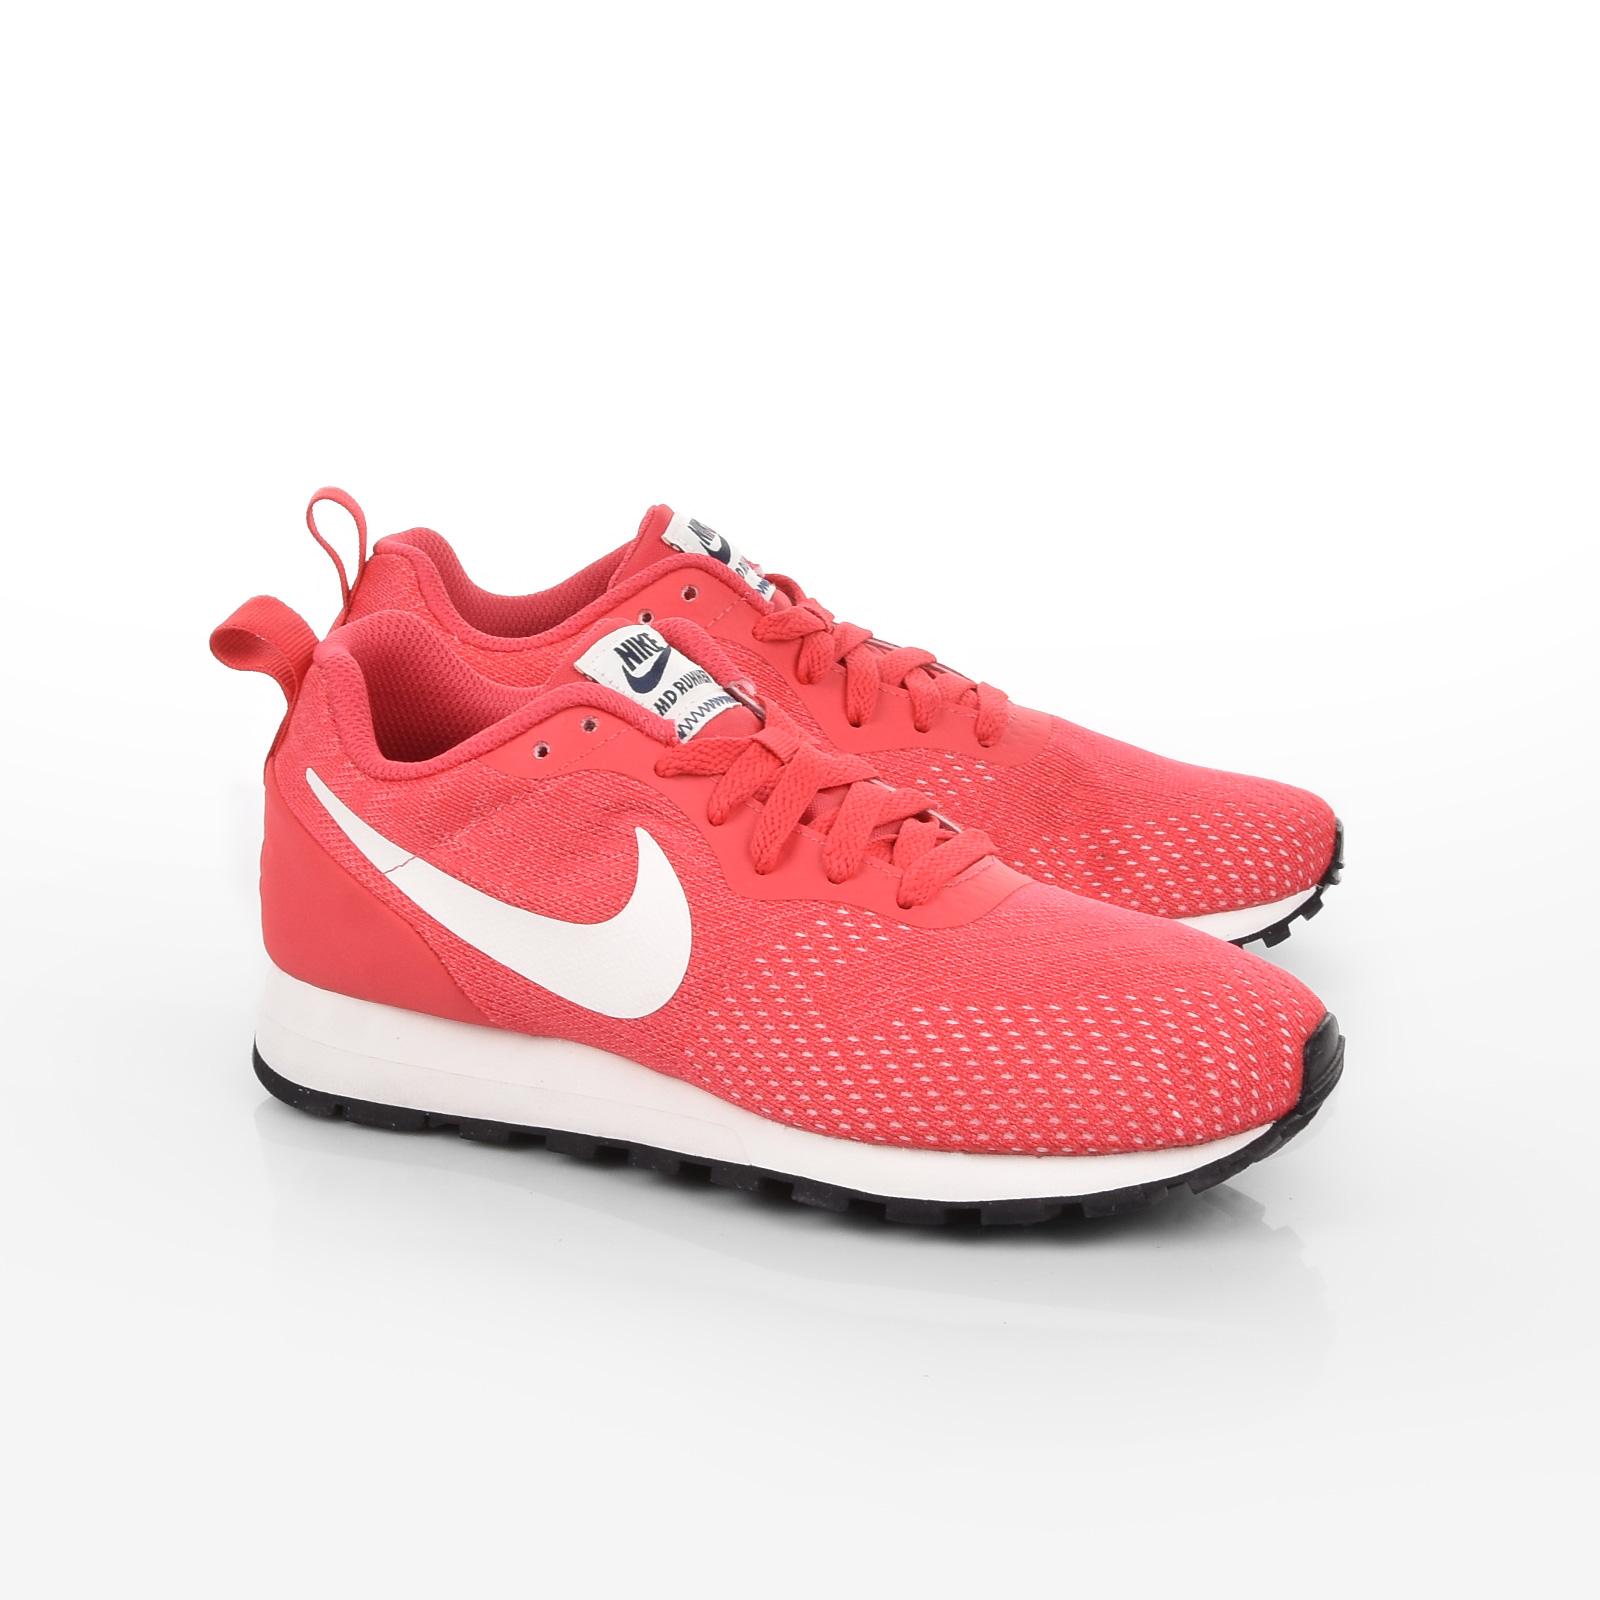 Nike - WMNS NIKE MD RUNNER 2 ENG MESH - TROPICAL PINK/SAIL-NAVY-SEA CORAL